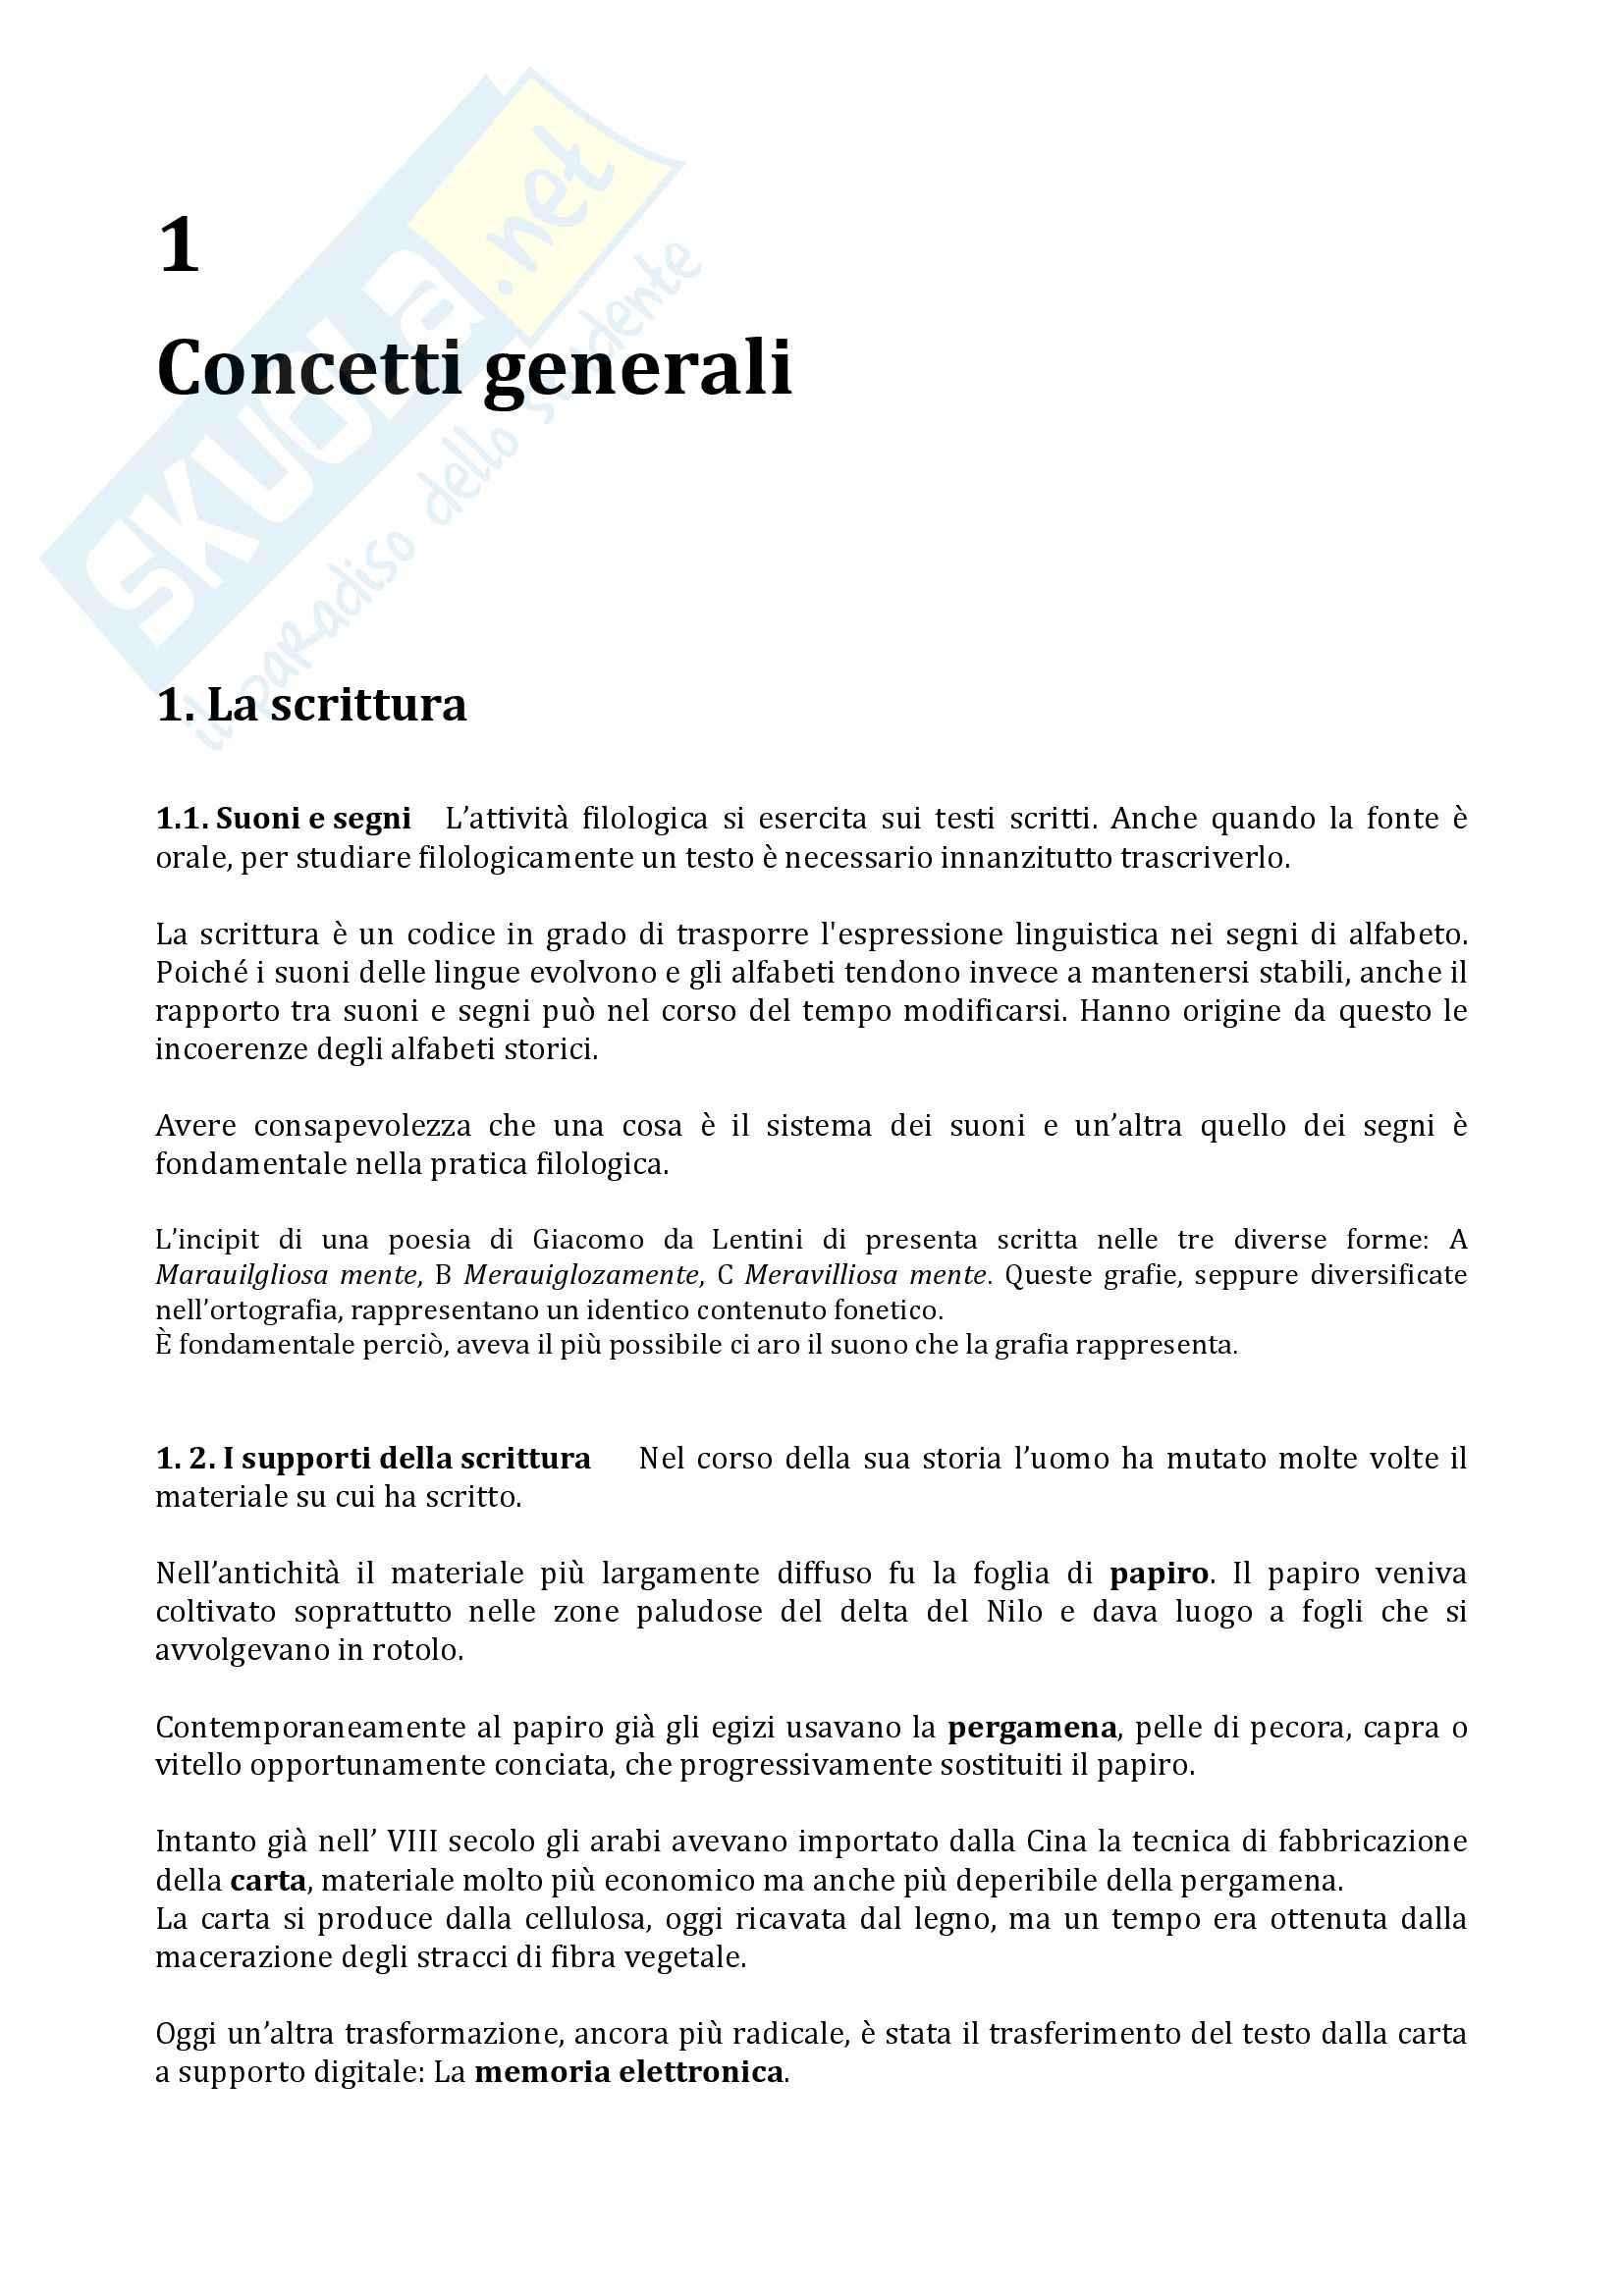 appunto G. Arbizzoni Artuso Filologia italiana